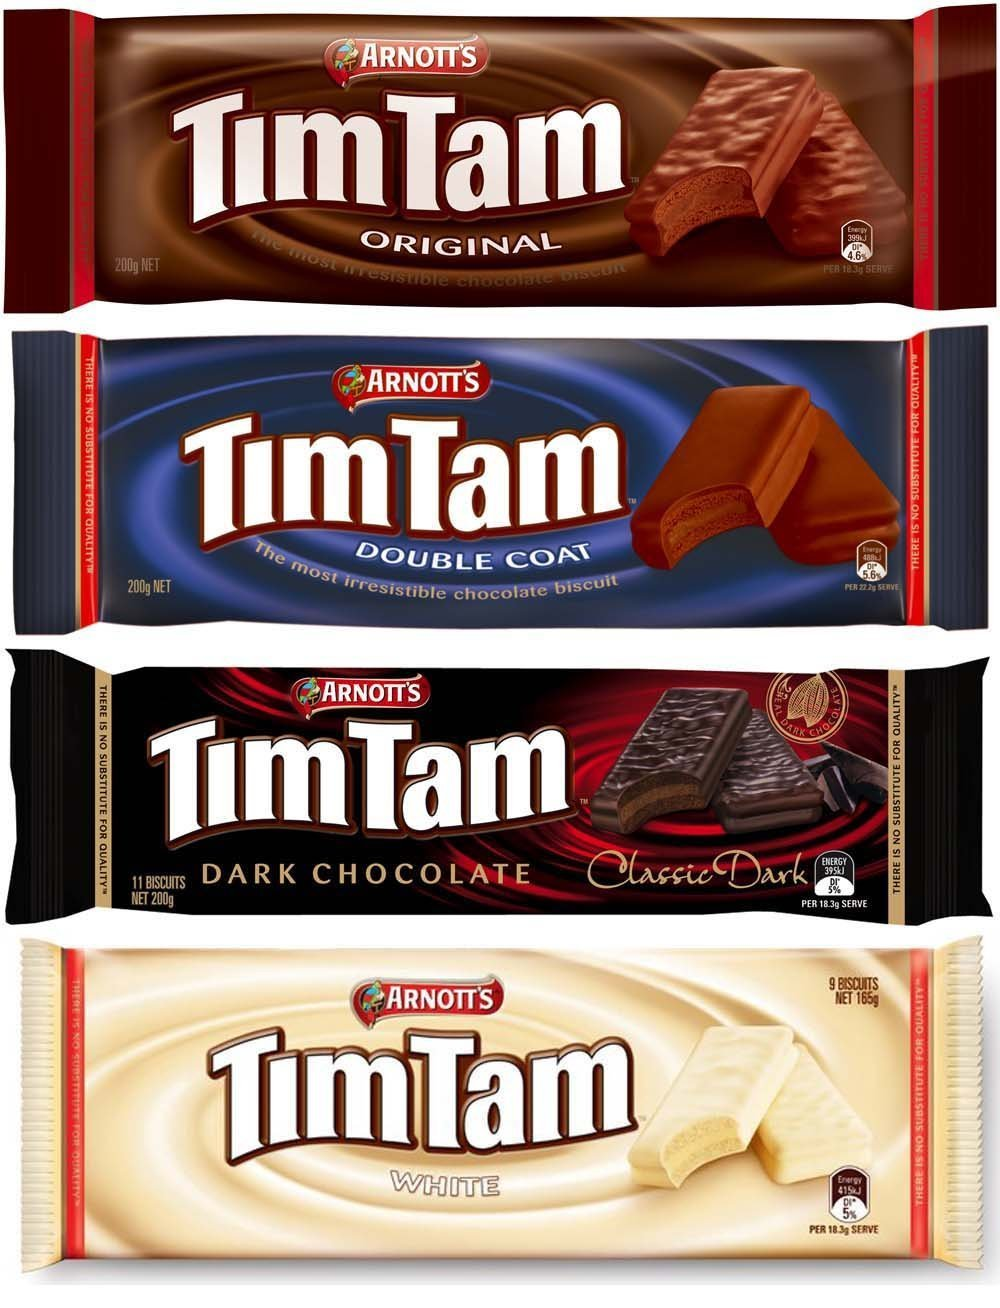 Tim Tam Cookies Arnotts | Australian Classics Sampler 4 Pack x (2 Pack) (=Total 8 Pack)